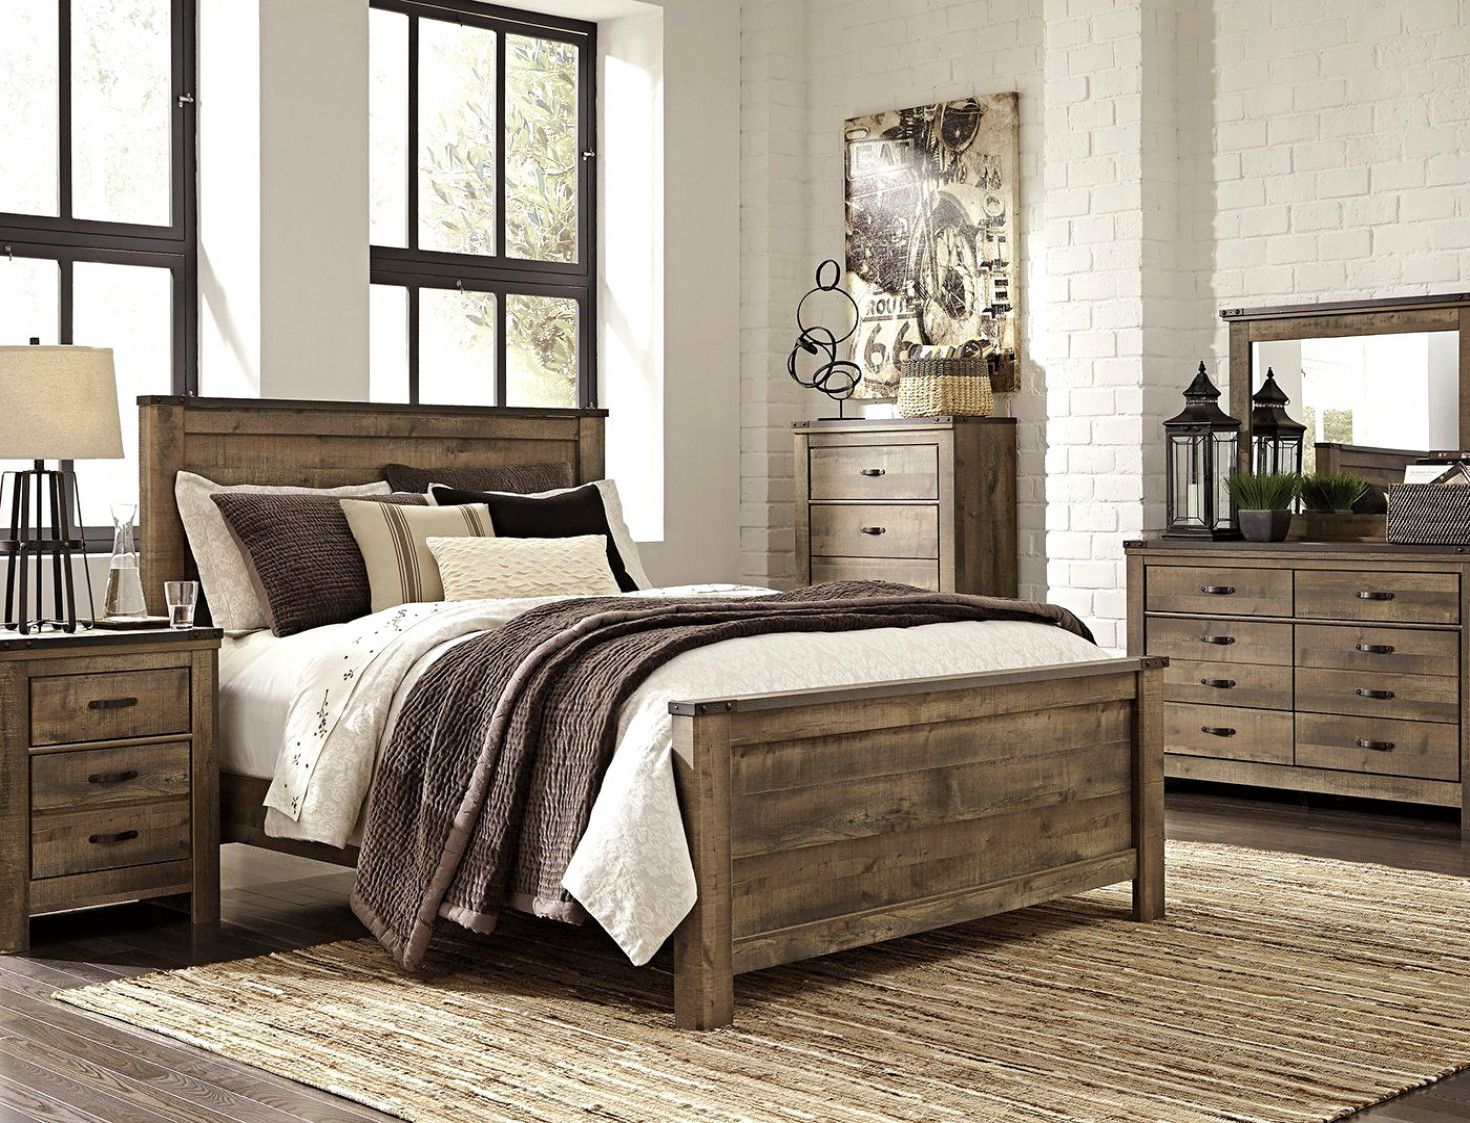 Trinell King Panel Bed King bedroom sets, Wood bedroom